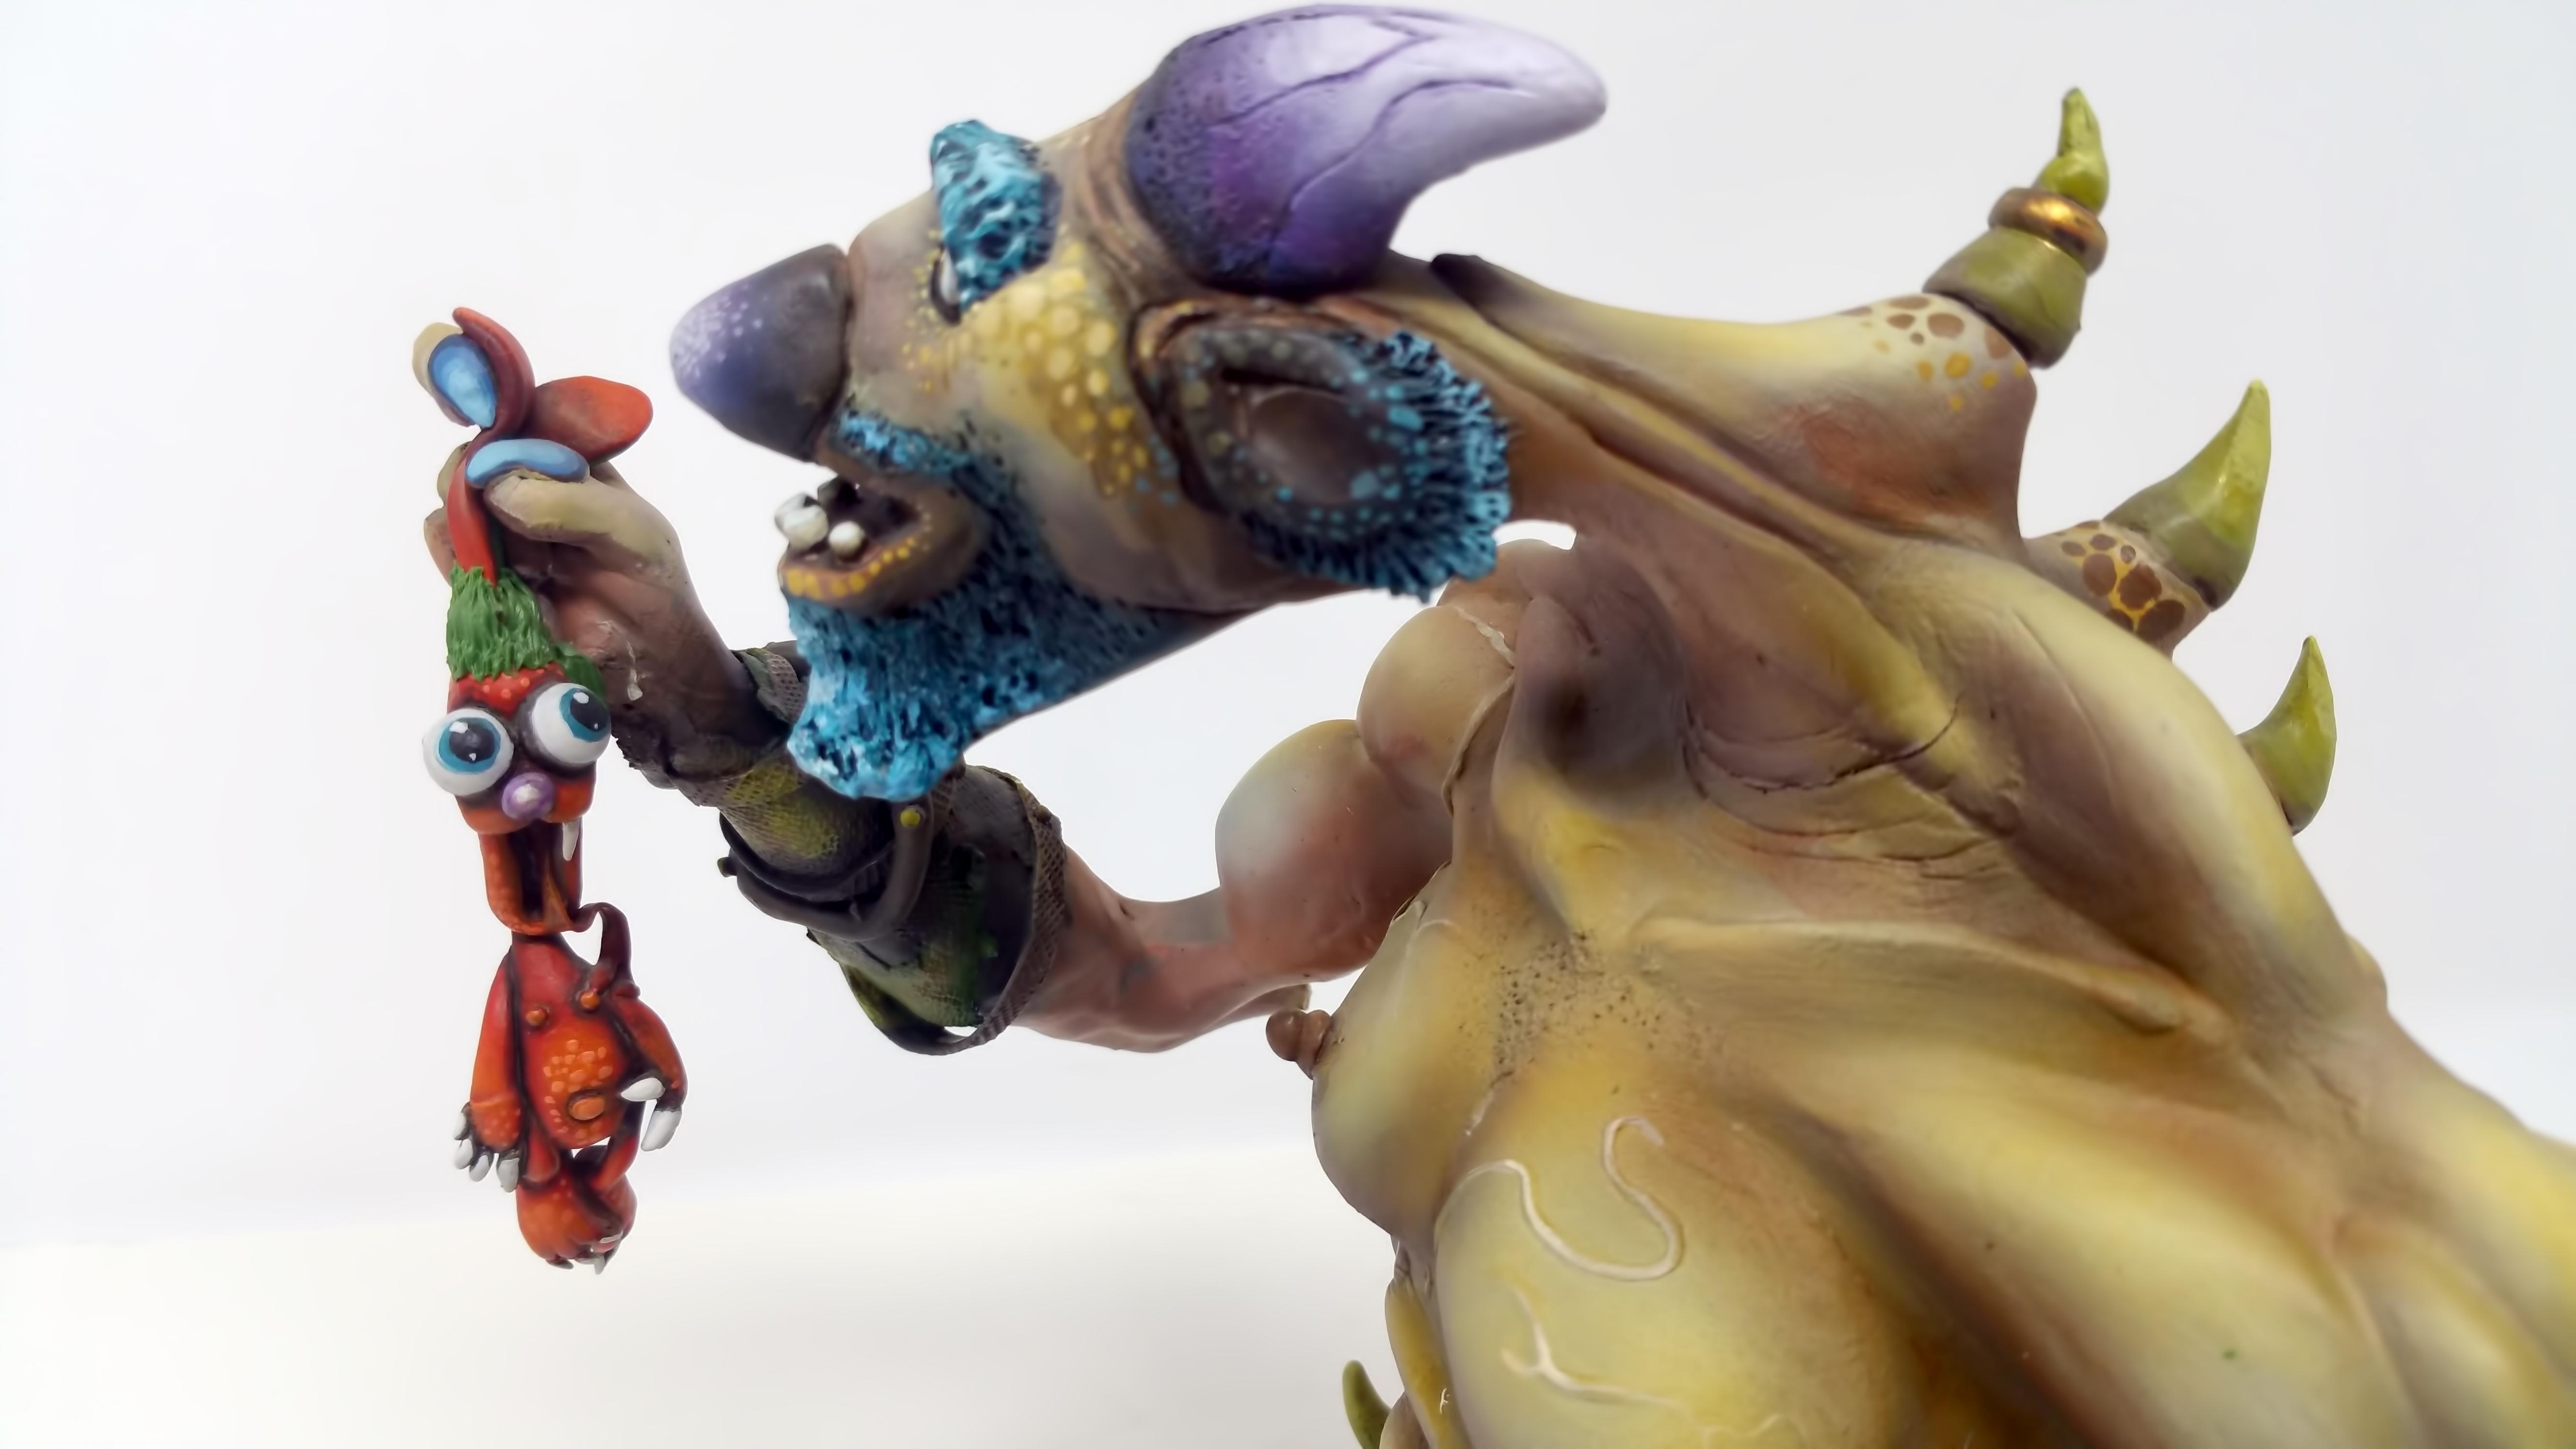 Max Schiavetta - Fantasy Art